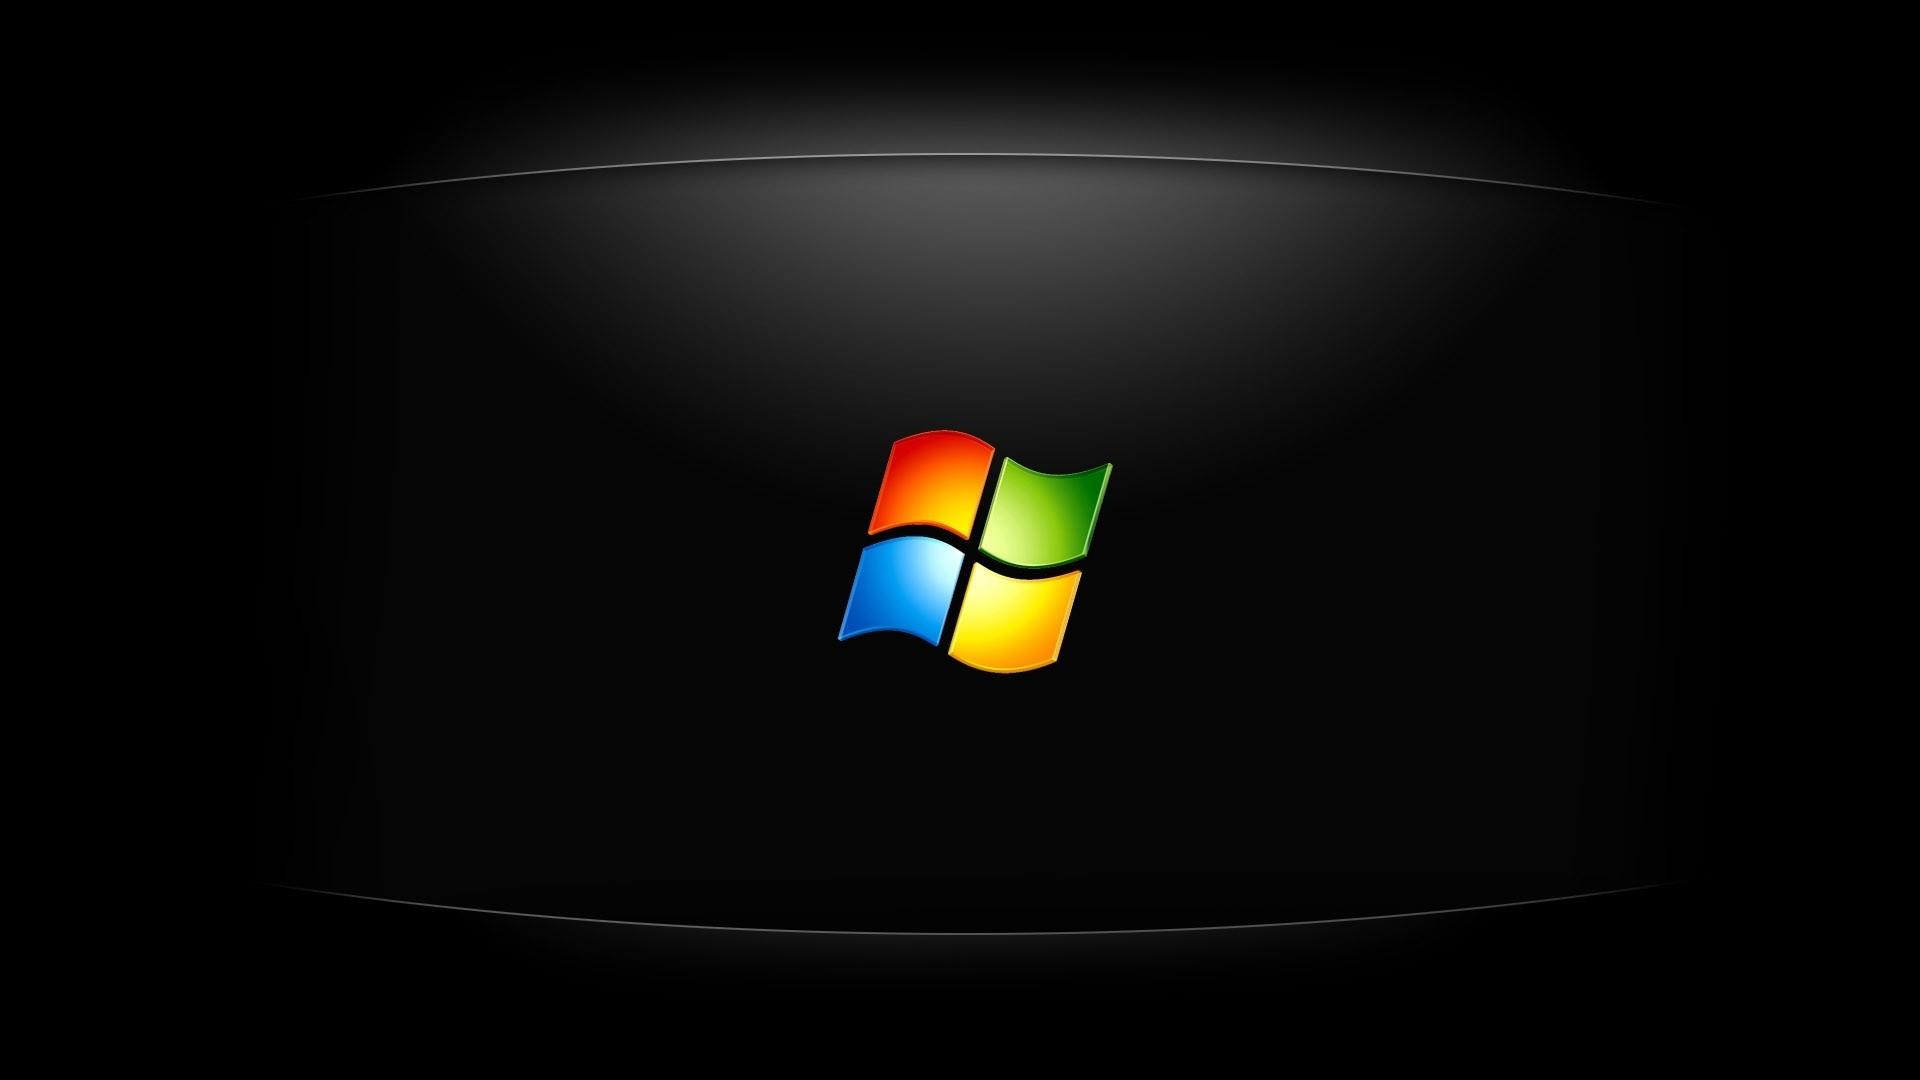 Windows 7 Wallpaper 1920x1080 Wallpapersafari